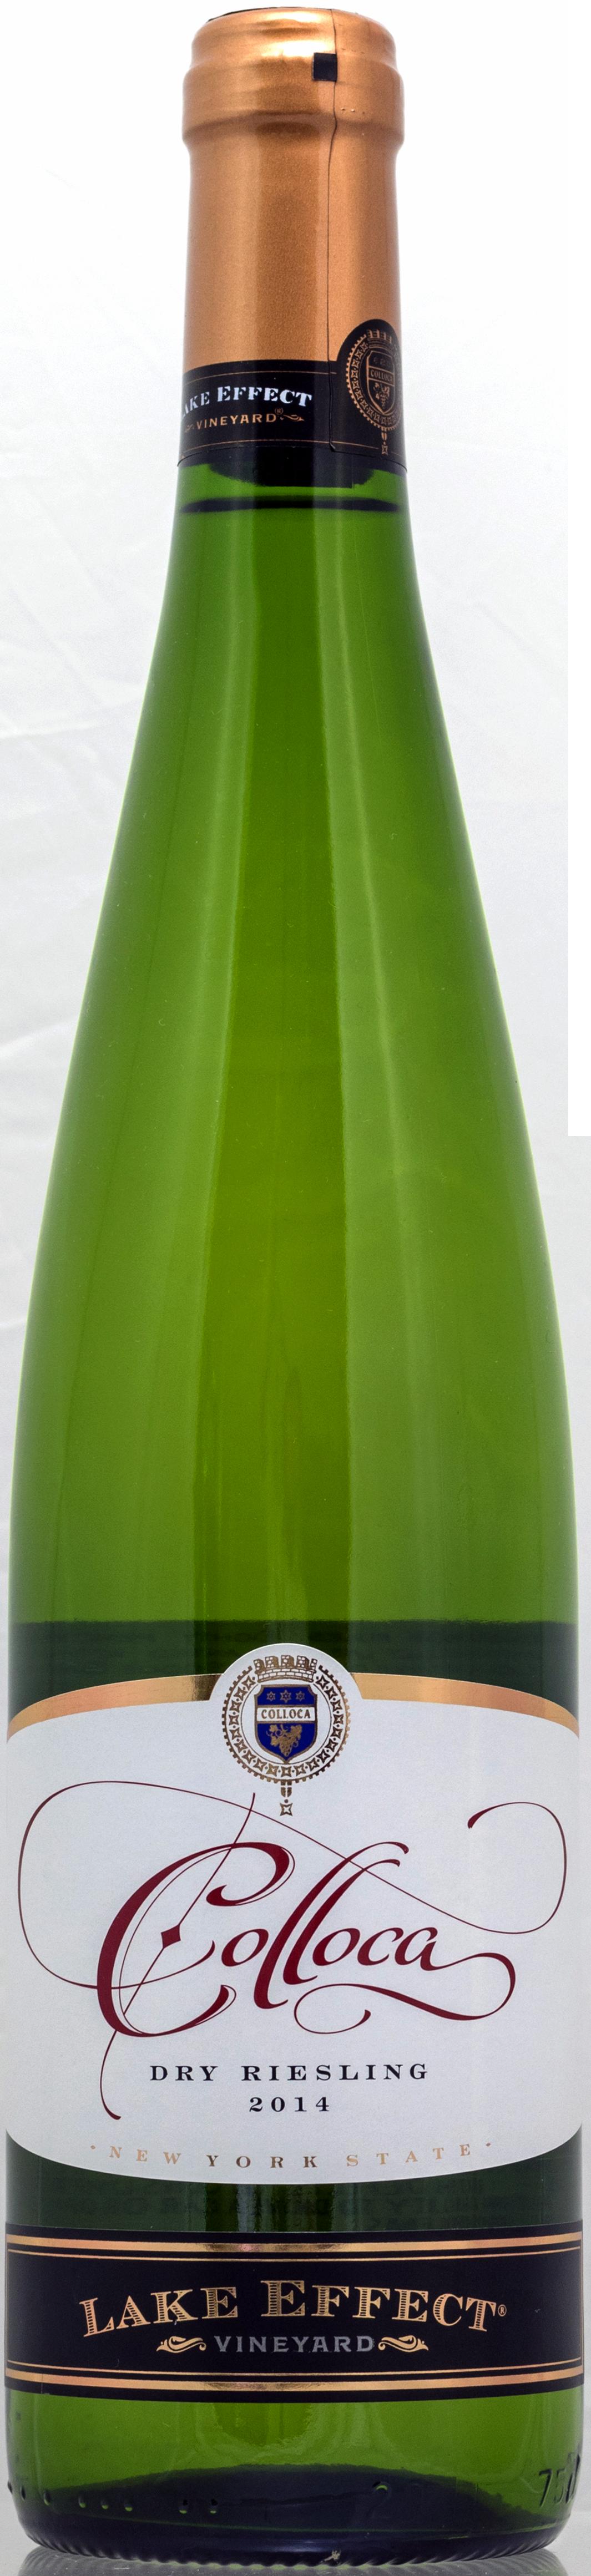 2013 Colloca Estate Lake Effect Vineyard® Dry Riesling -